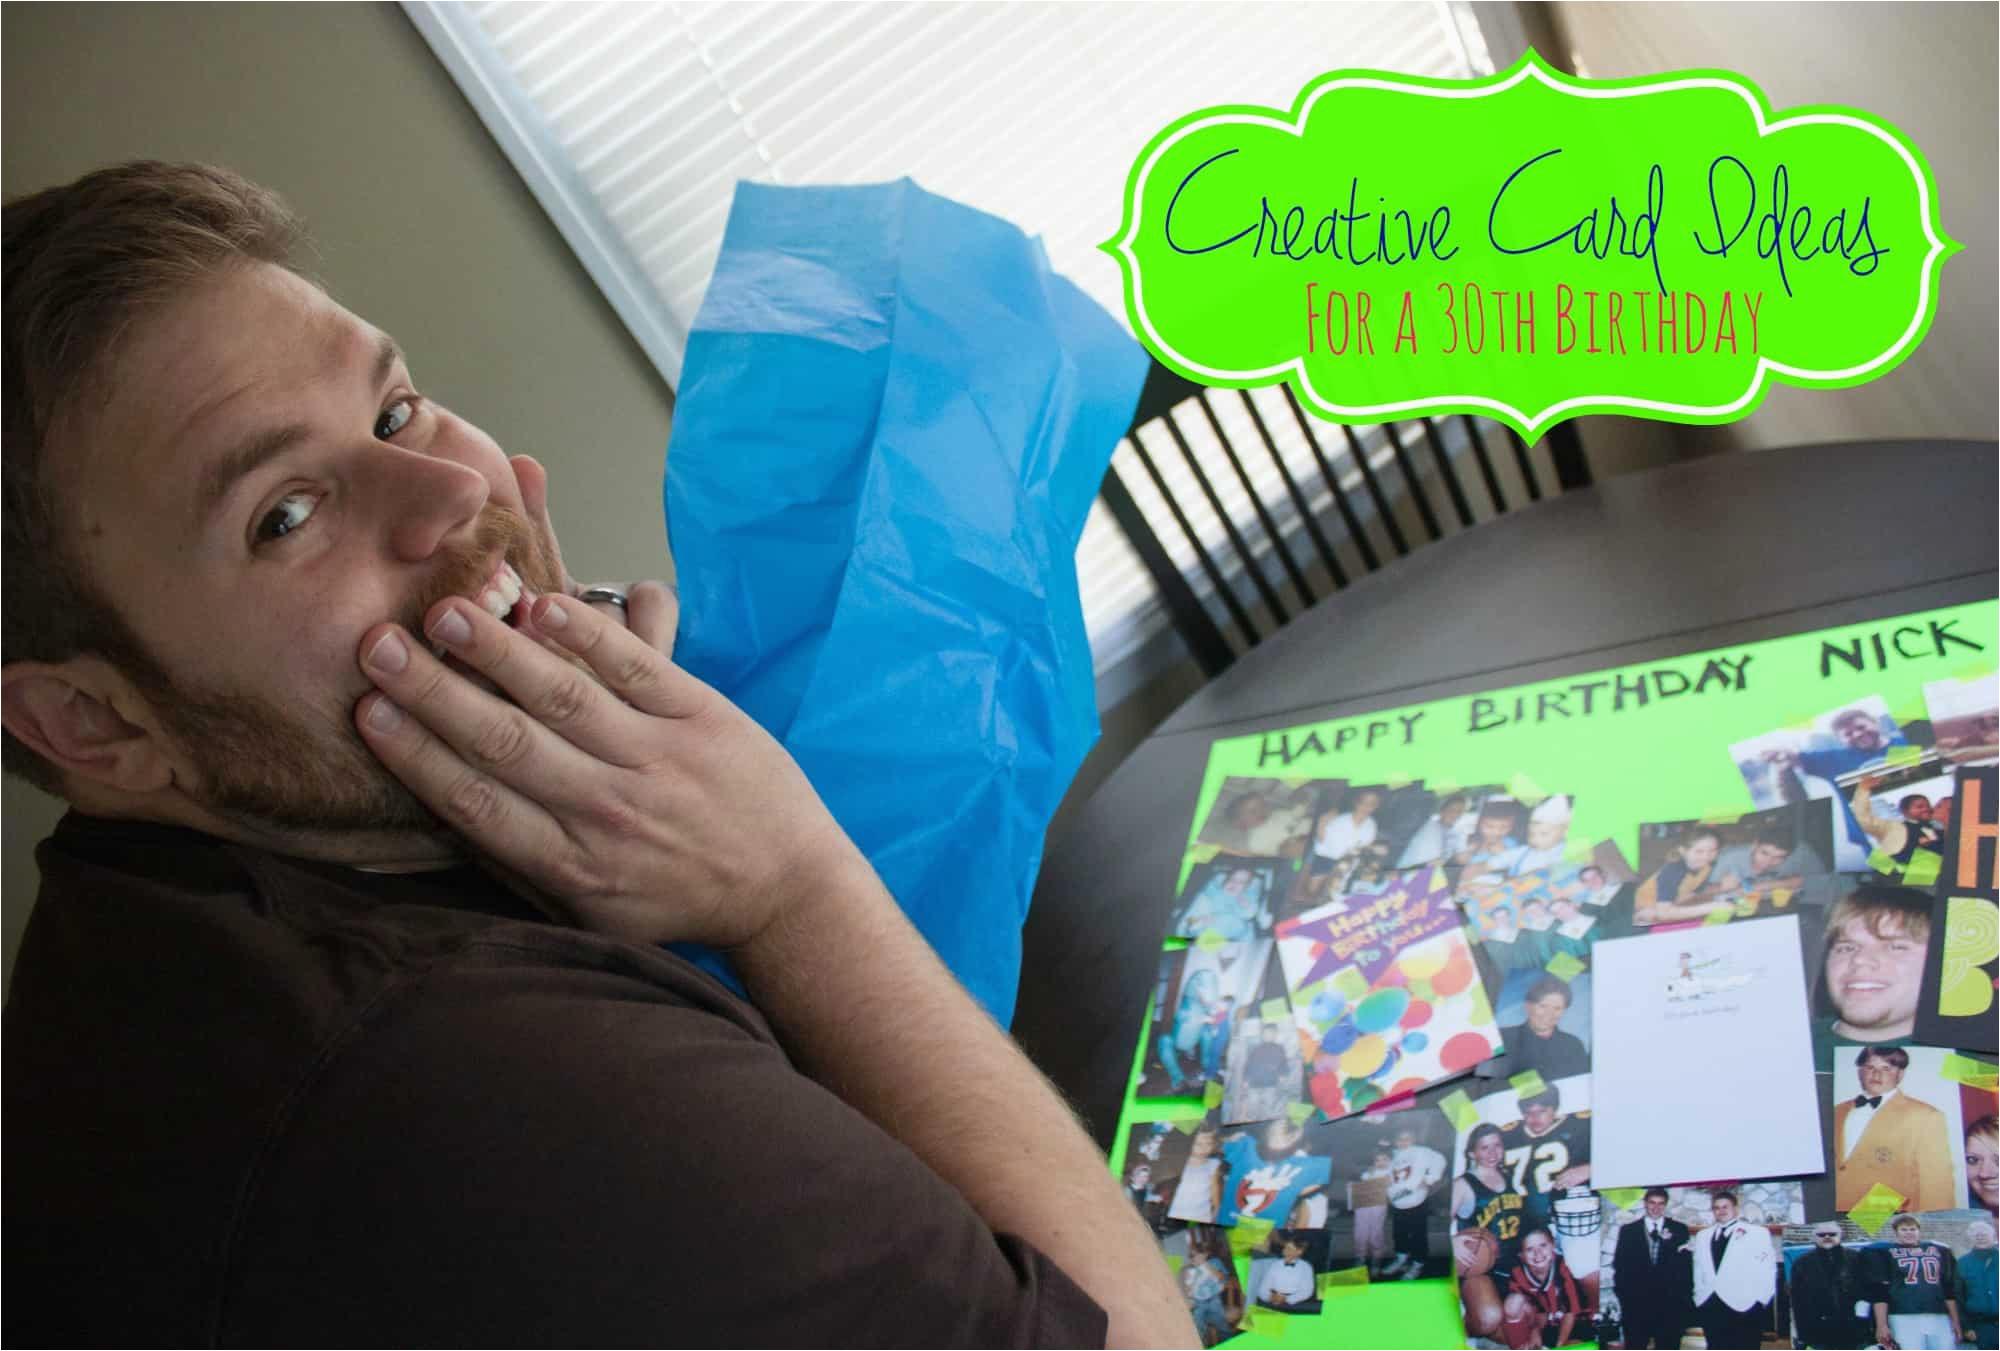 creative card ideas 30th birthday